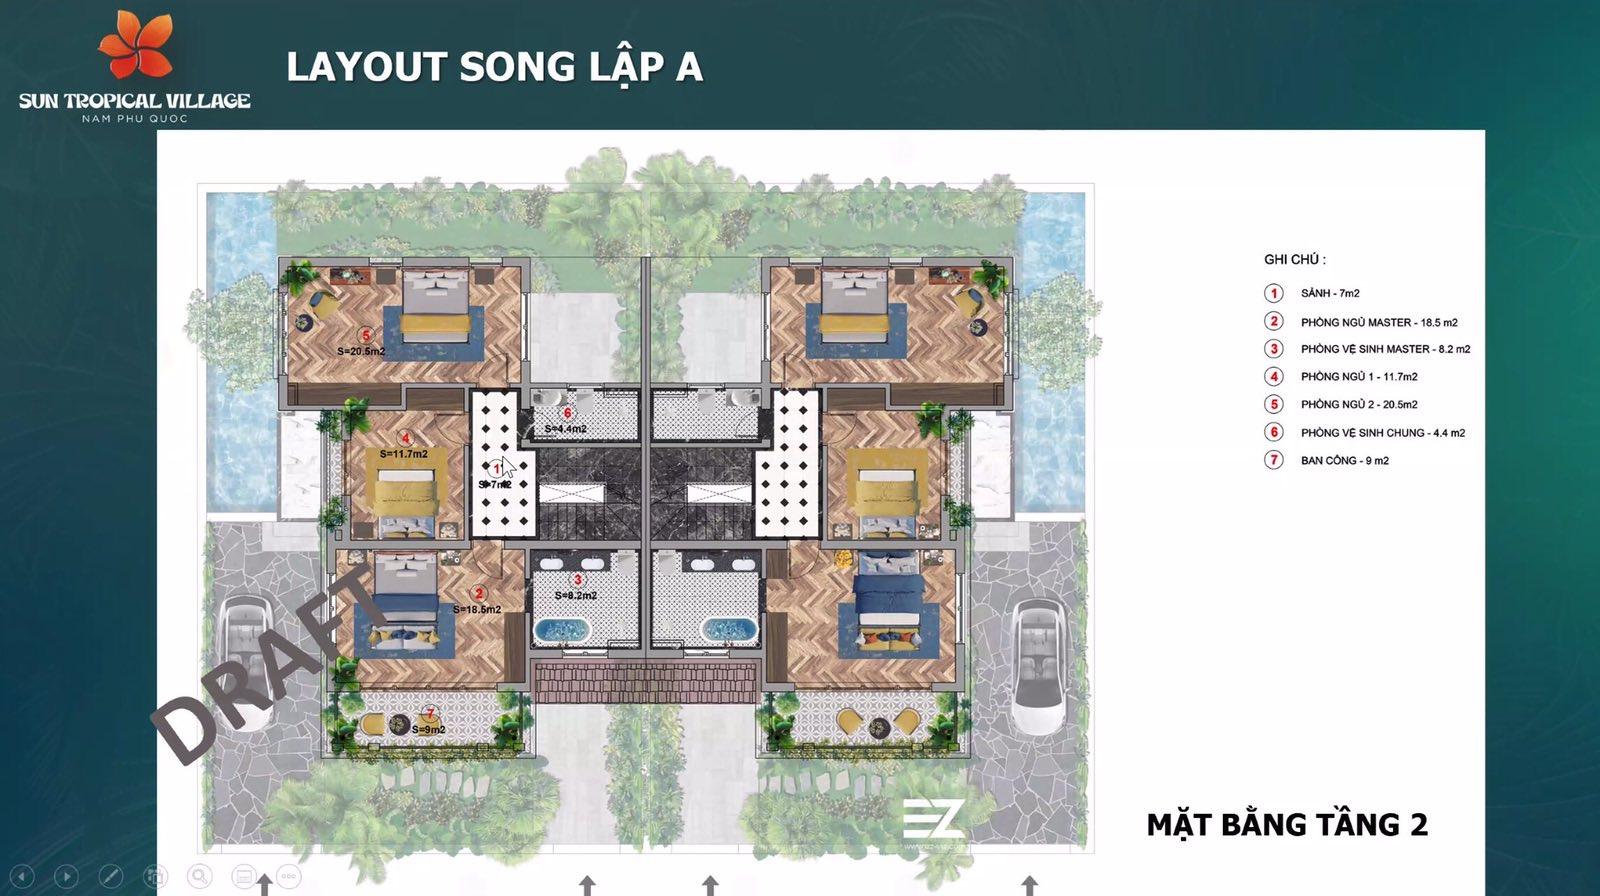 Layout biệt thự mẫu Sun Tropical Village Phú Quốc 8